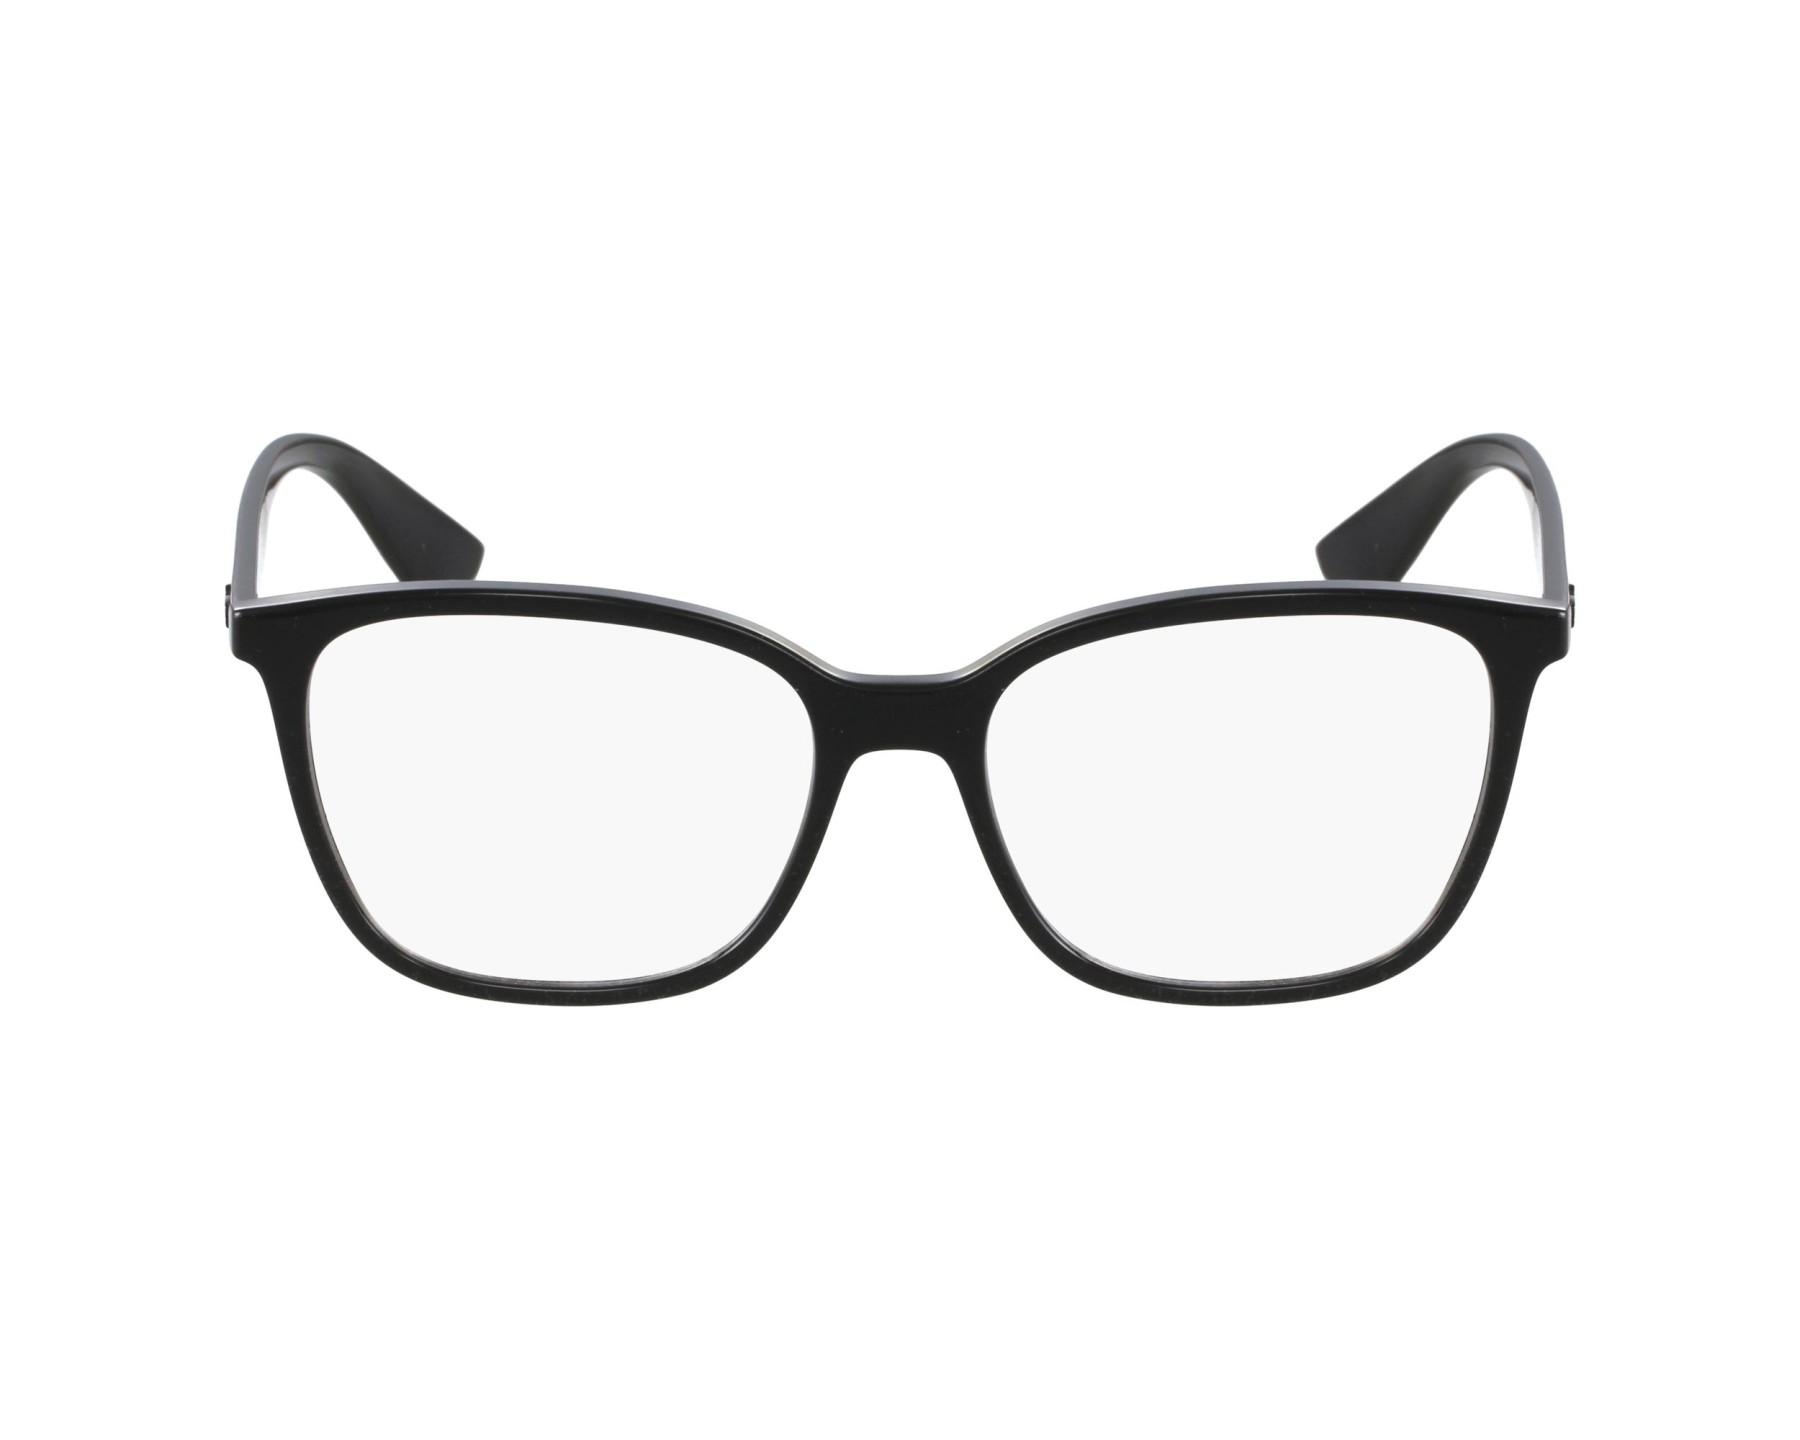 eyeglasses Ray-Ban RX-7066 2000 - Black profile view 53a8e94b30f